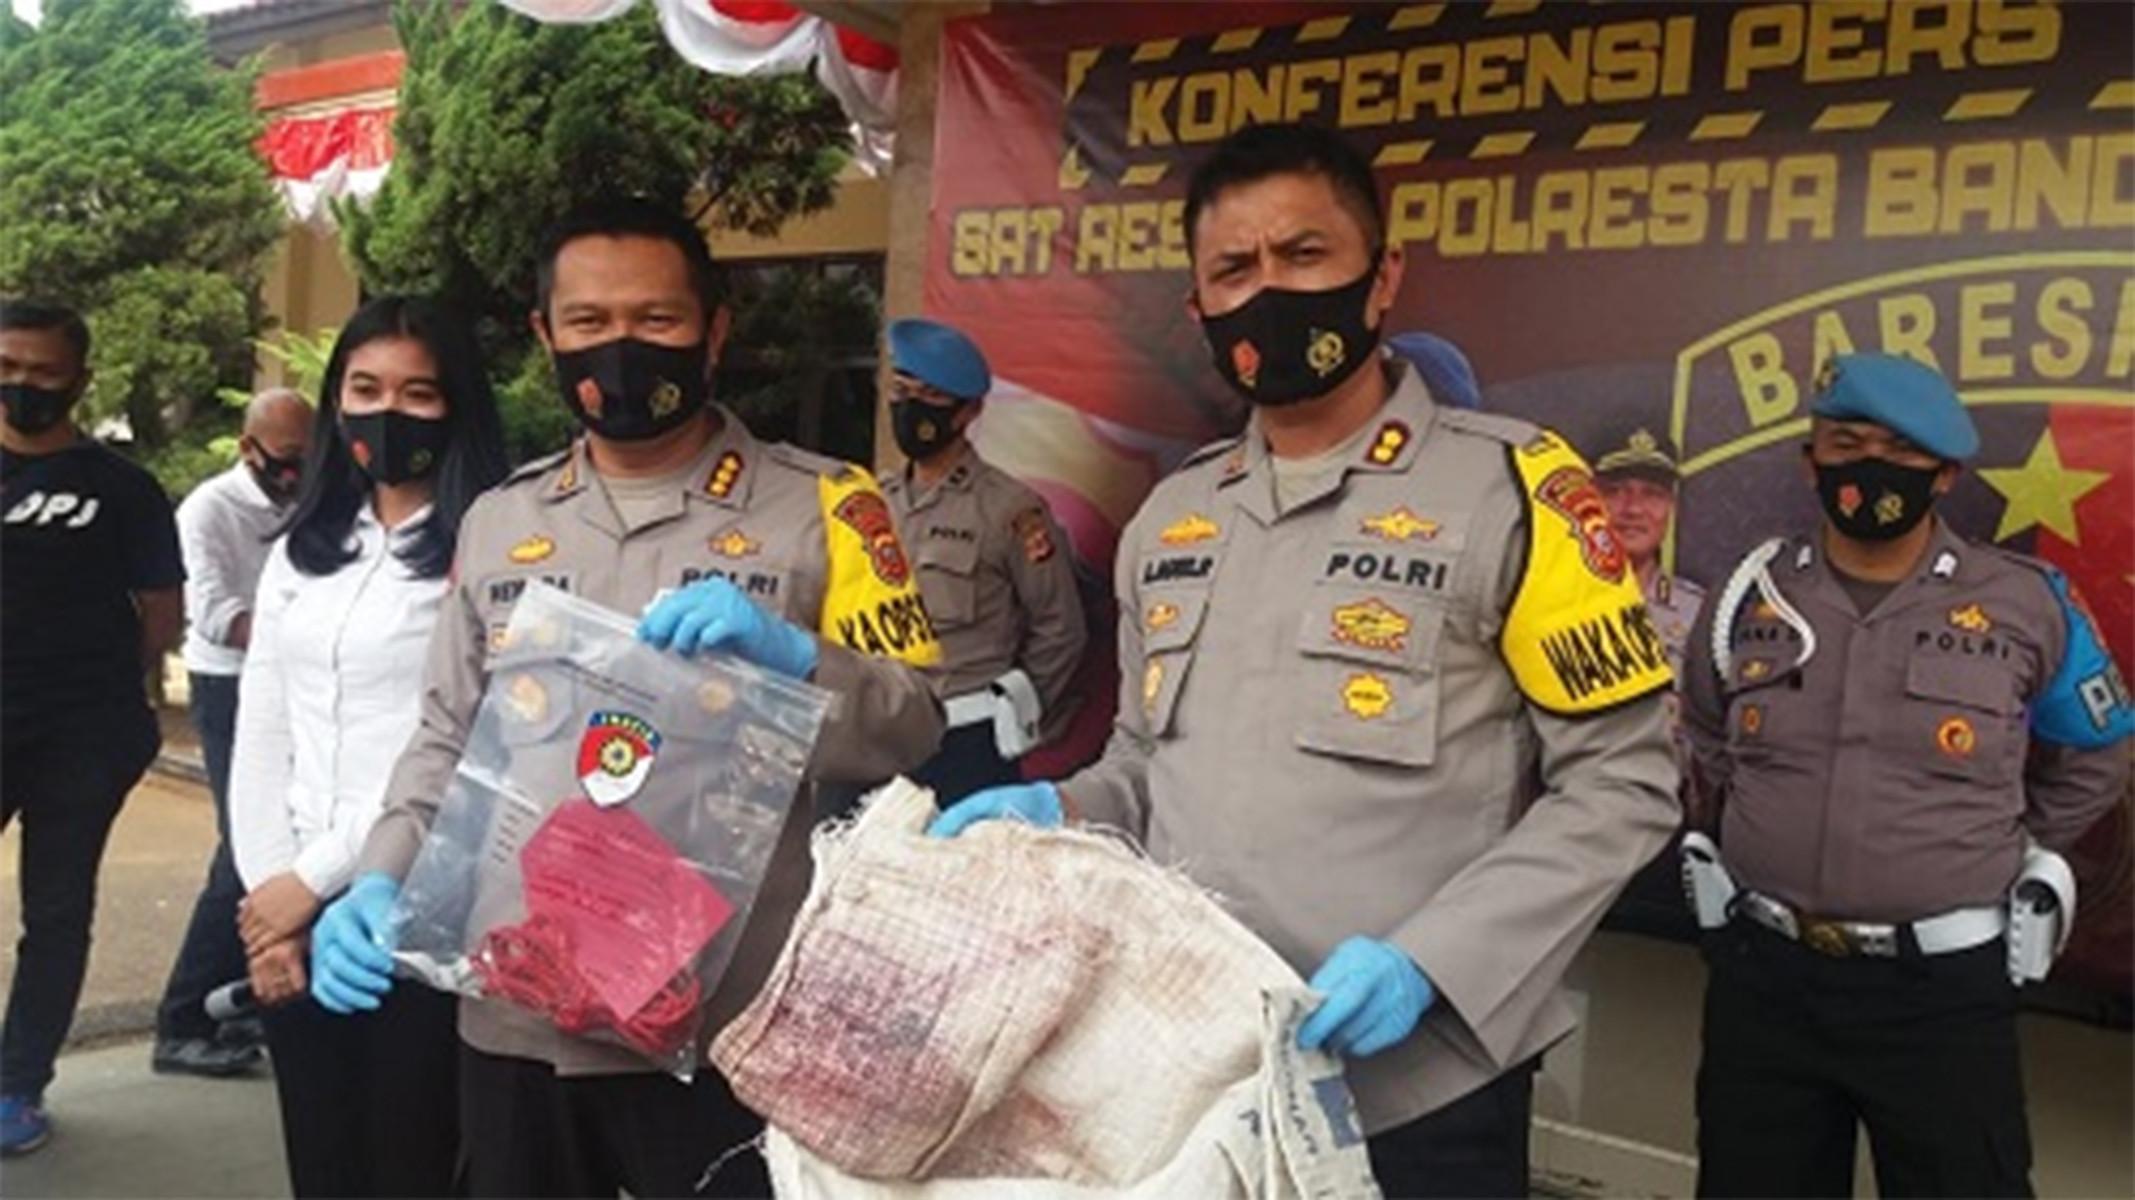 Anak SMA di Rancaekek Dibunuh Pacar Usai Begituan, Mayatnya Dimasukkan ke Dalam Karung - JPNN.com